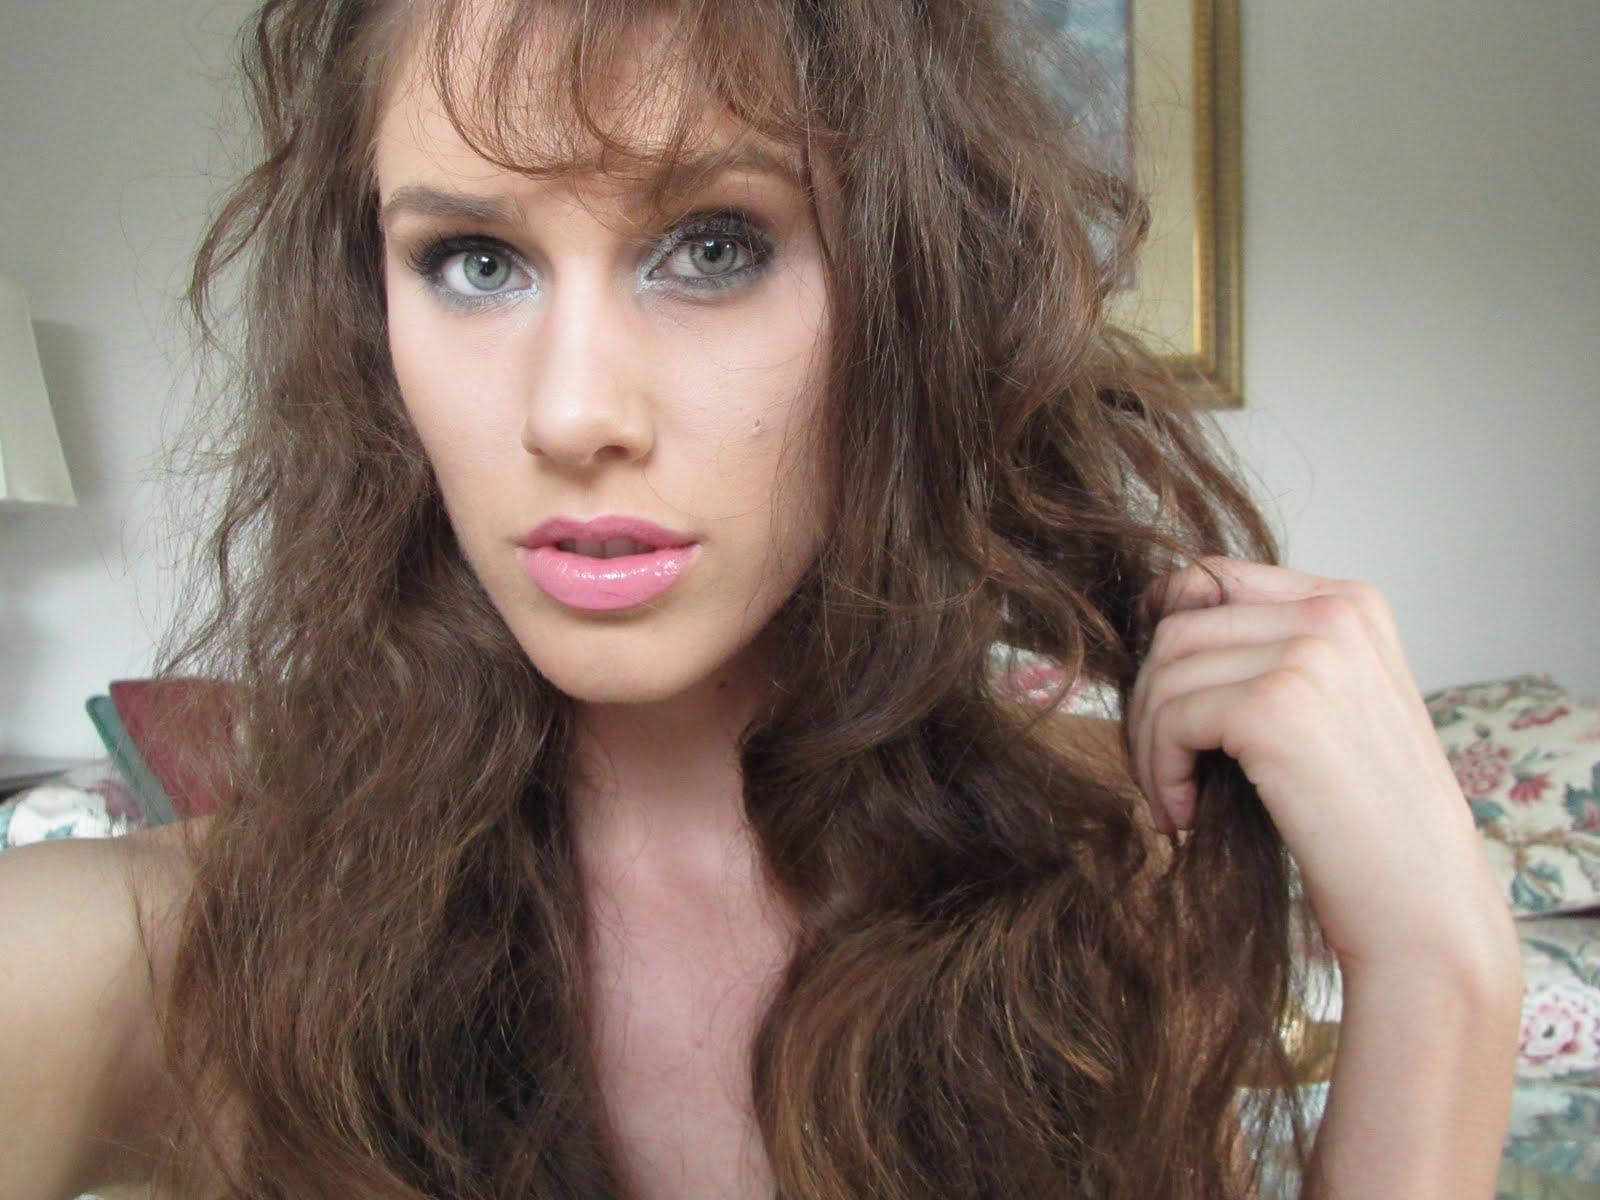 http://4.bp.blogspot.com/-xdHWzN5omzA/TosuE6jvVeI/AAAAAAAAAh0/l9r-678cnpM/s1600/leona-lewis-official-music-video-collide-avicci-photo-picture-makeup-tutorial-look-how-to-cosmetics-make-up-leona-lewis-435435-diamondsandheels14.jpg